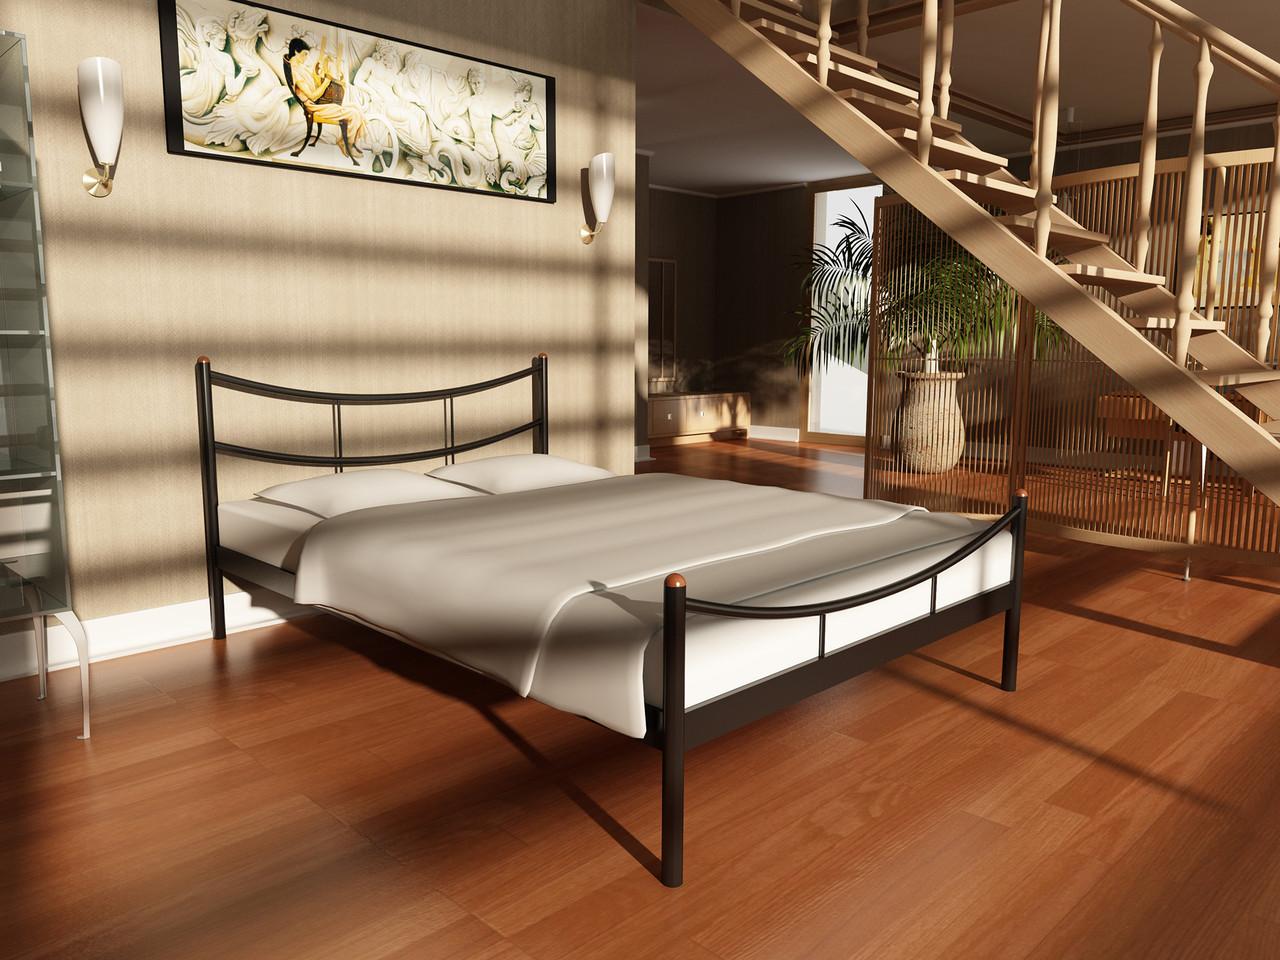 Кровать Сакура / Sakura, фабрика Метакам